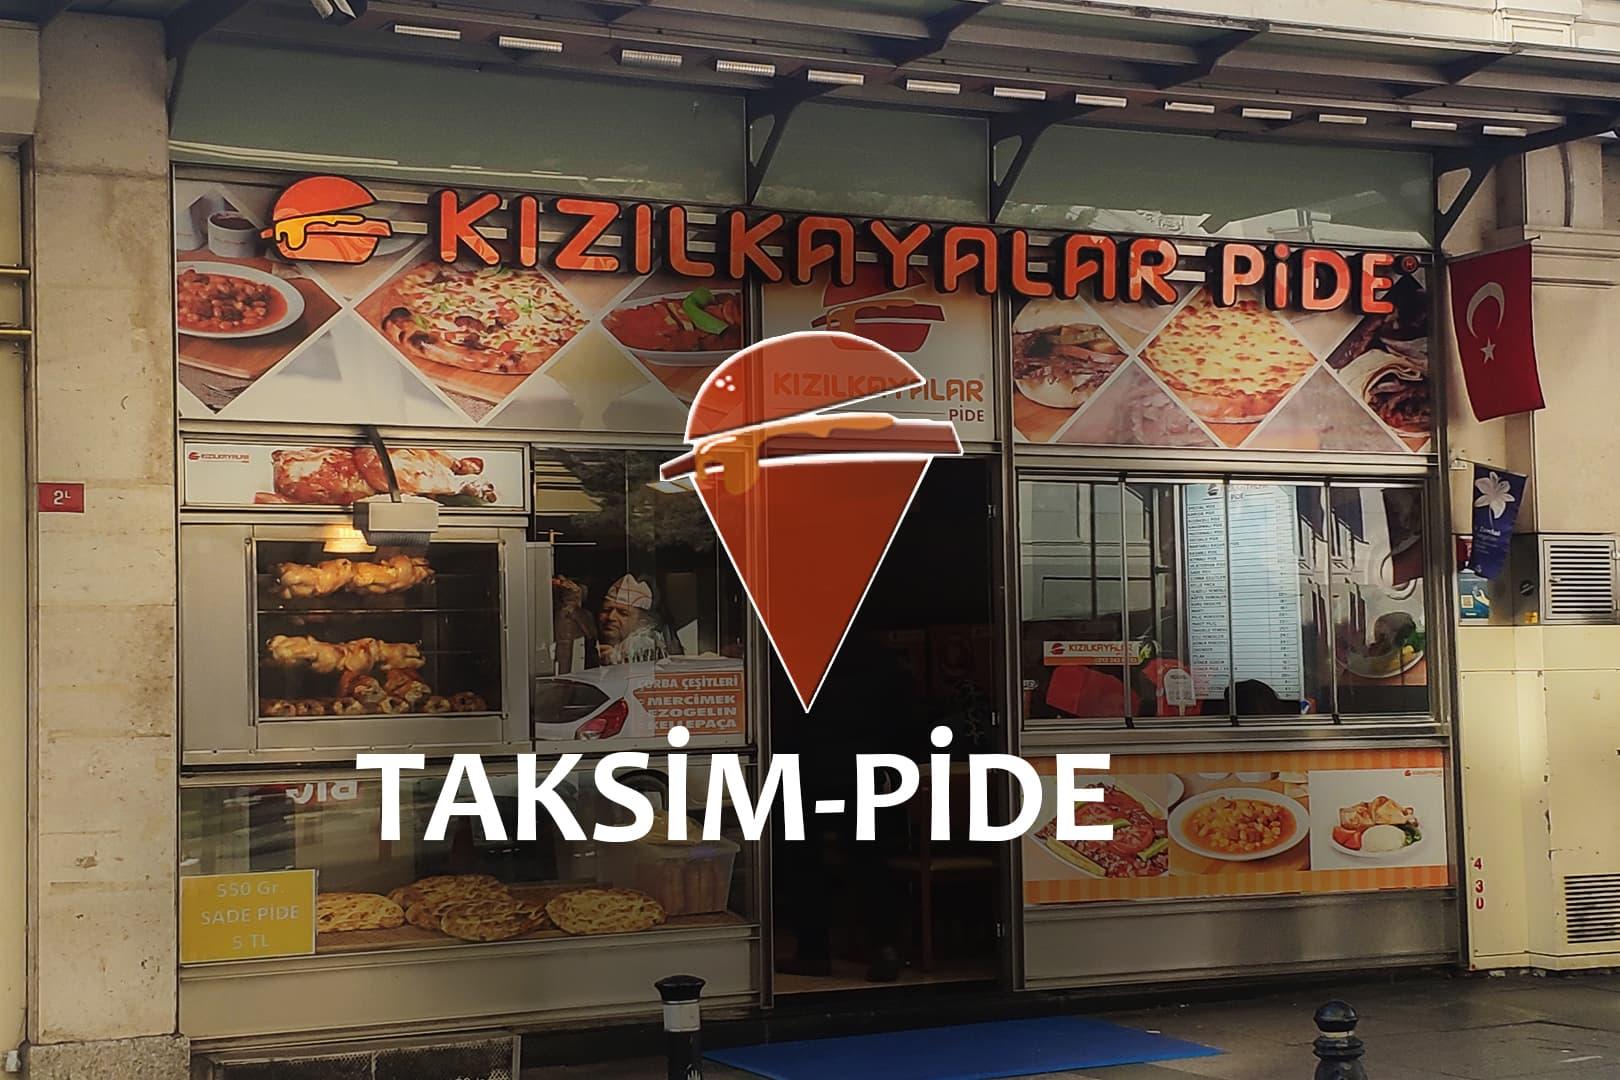 Kızılkayalar Taksim-Pide فرع شجرة